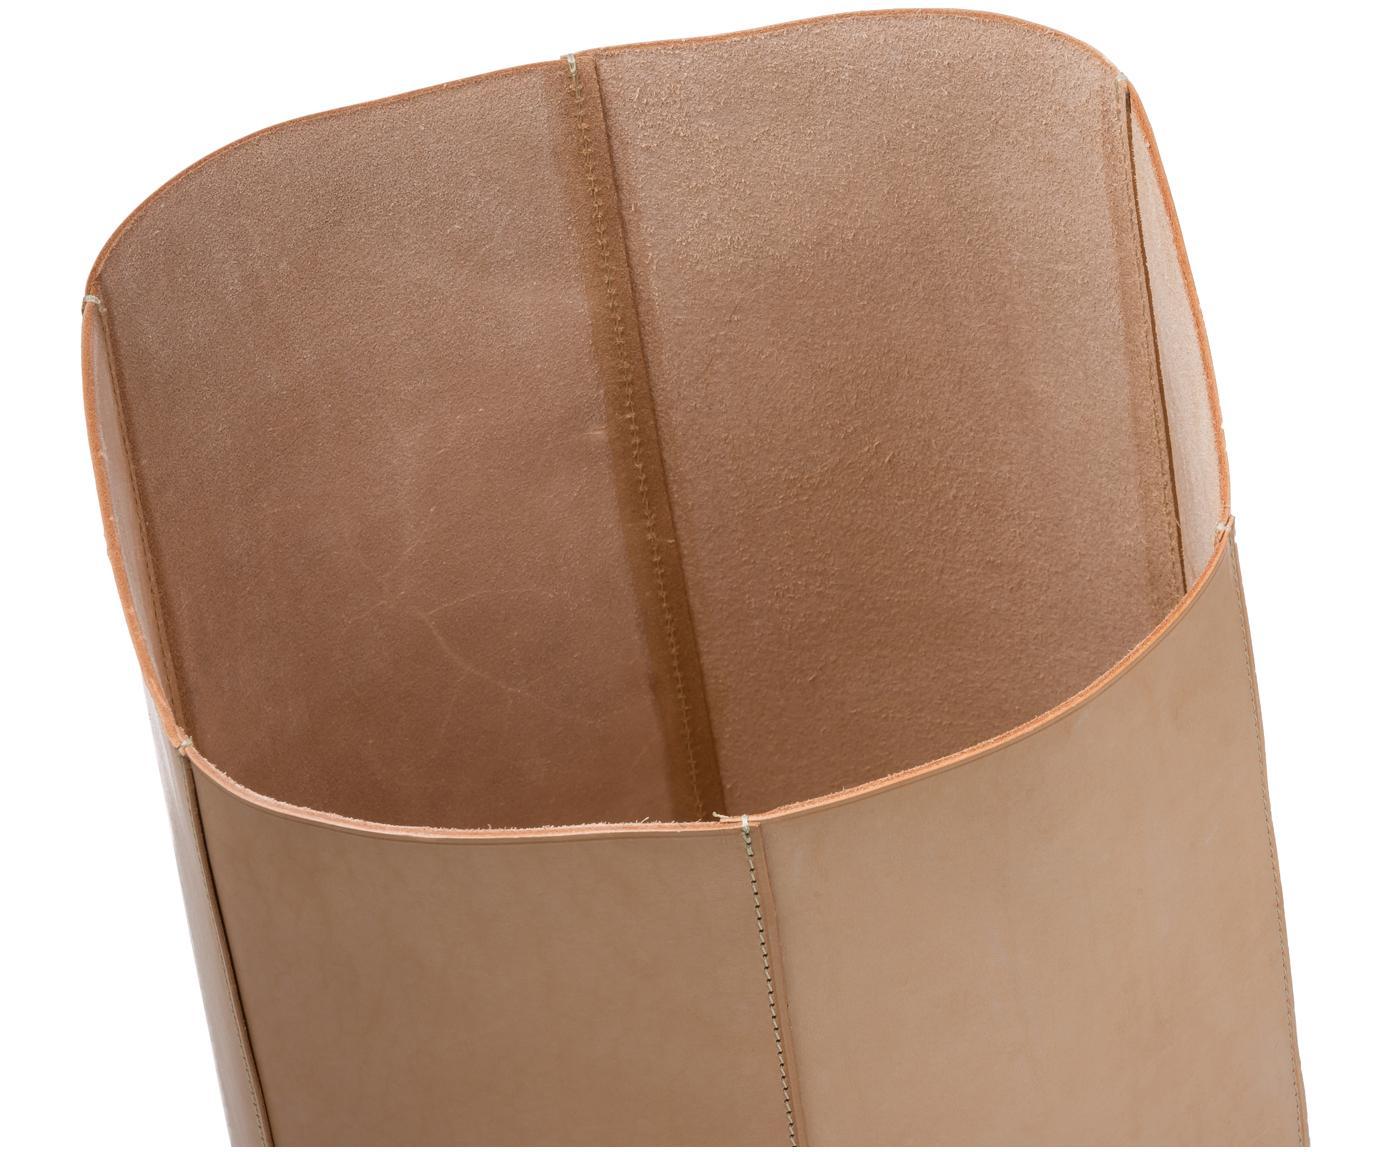 Leder-Papierkorb Hexagon, Leder, genarbt, Beige, 23 x 35 cm